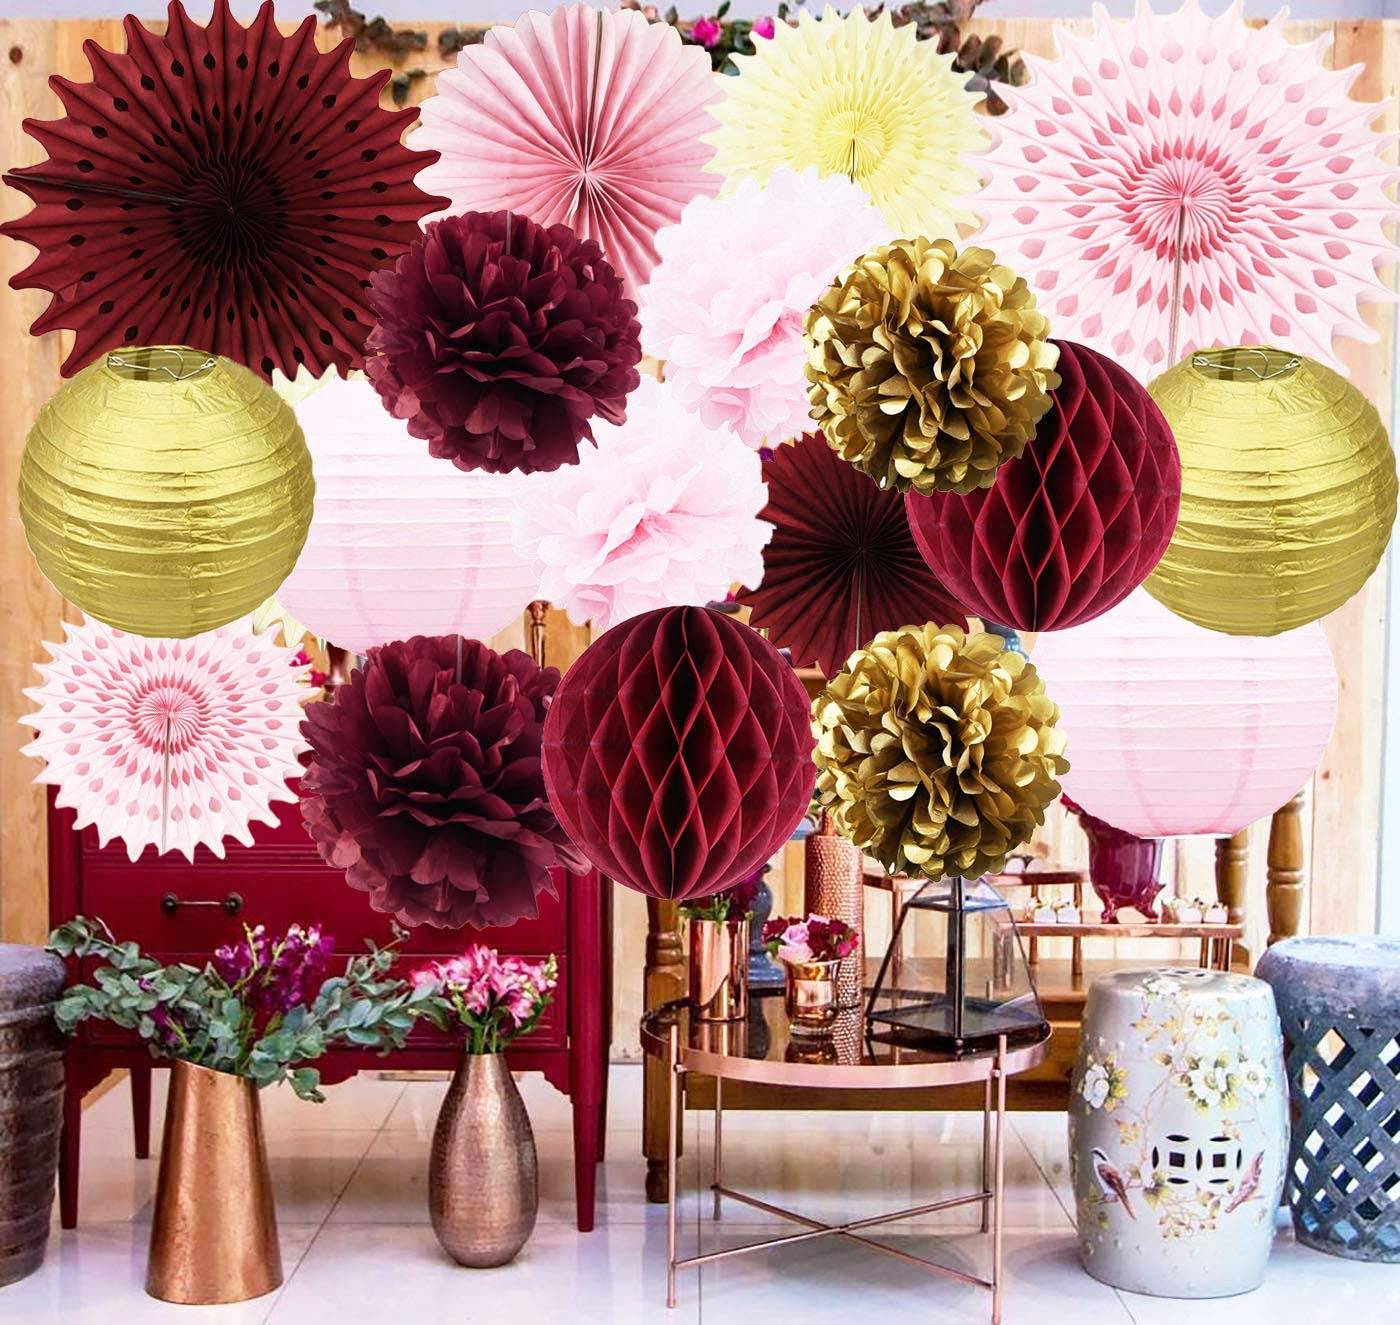 Maroon Bridal Shower Decorations Burgundy Pink Gold Birthday Party Decorations/Burgundy Wedding Decor Tissue Pom Pom/Tissue Paper Fan/Honeycom Balls Lanterns Burgundy Baby Shower Decorations by Delaiwen